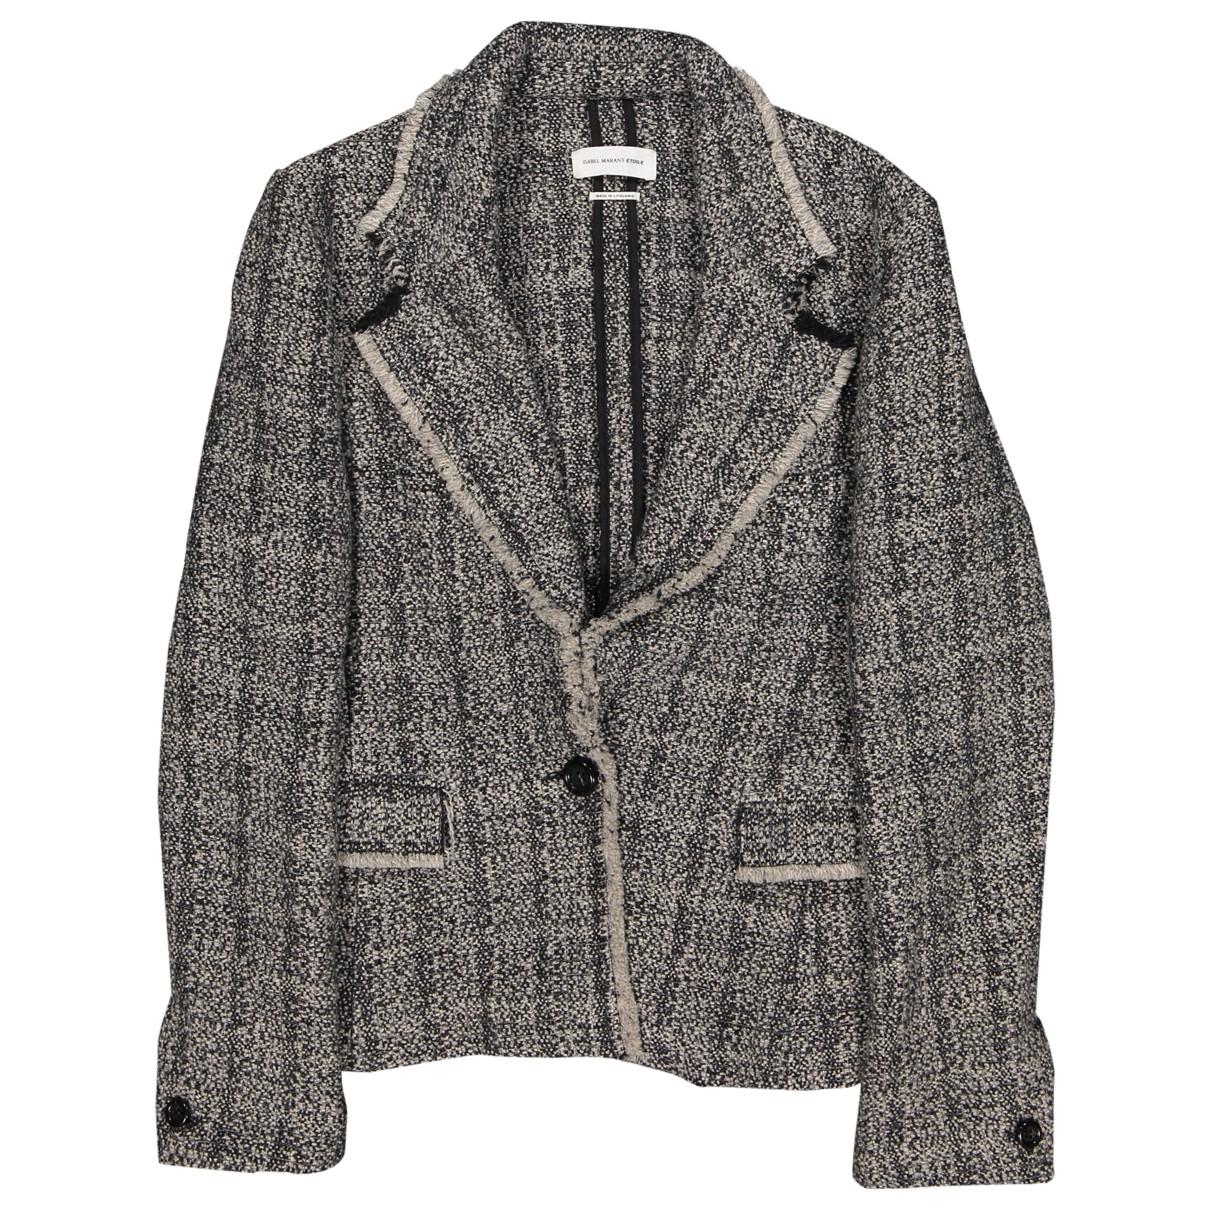 Isabel Marant Etoile \N Grey Wool jacket for Women 44 FR